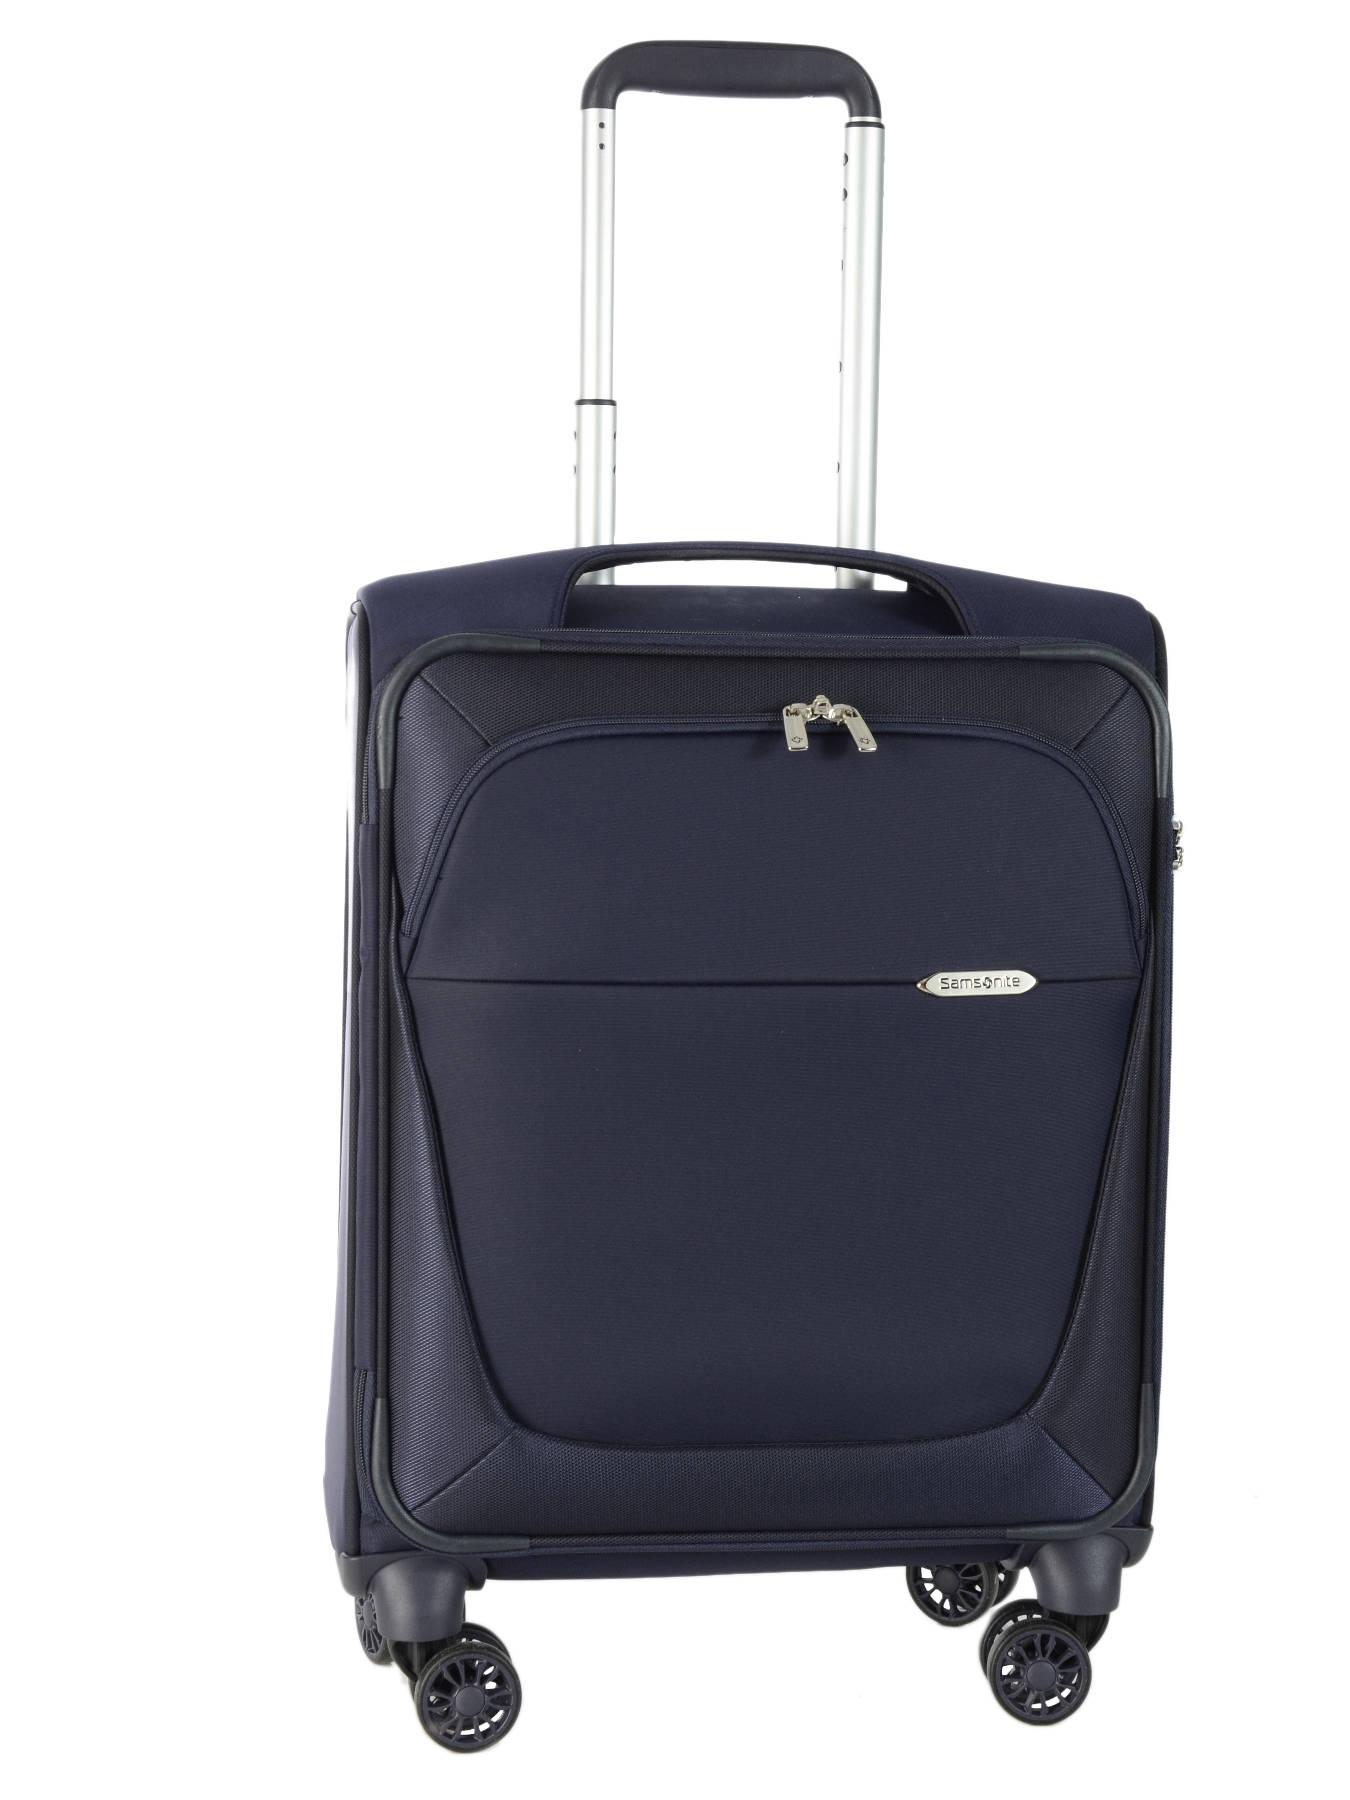 valise cabine samsonite b lite 3 deep blue en vente au meilleur prix. Black Bedroom Furniture Sets. Home Design Ideas